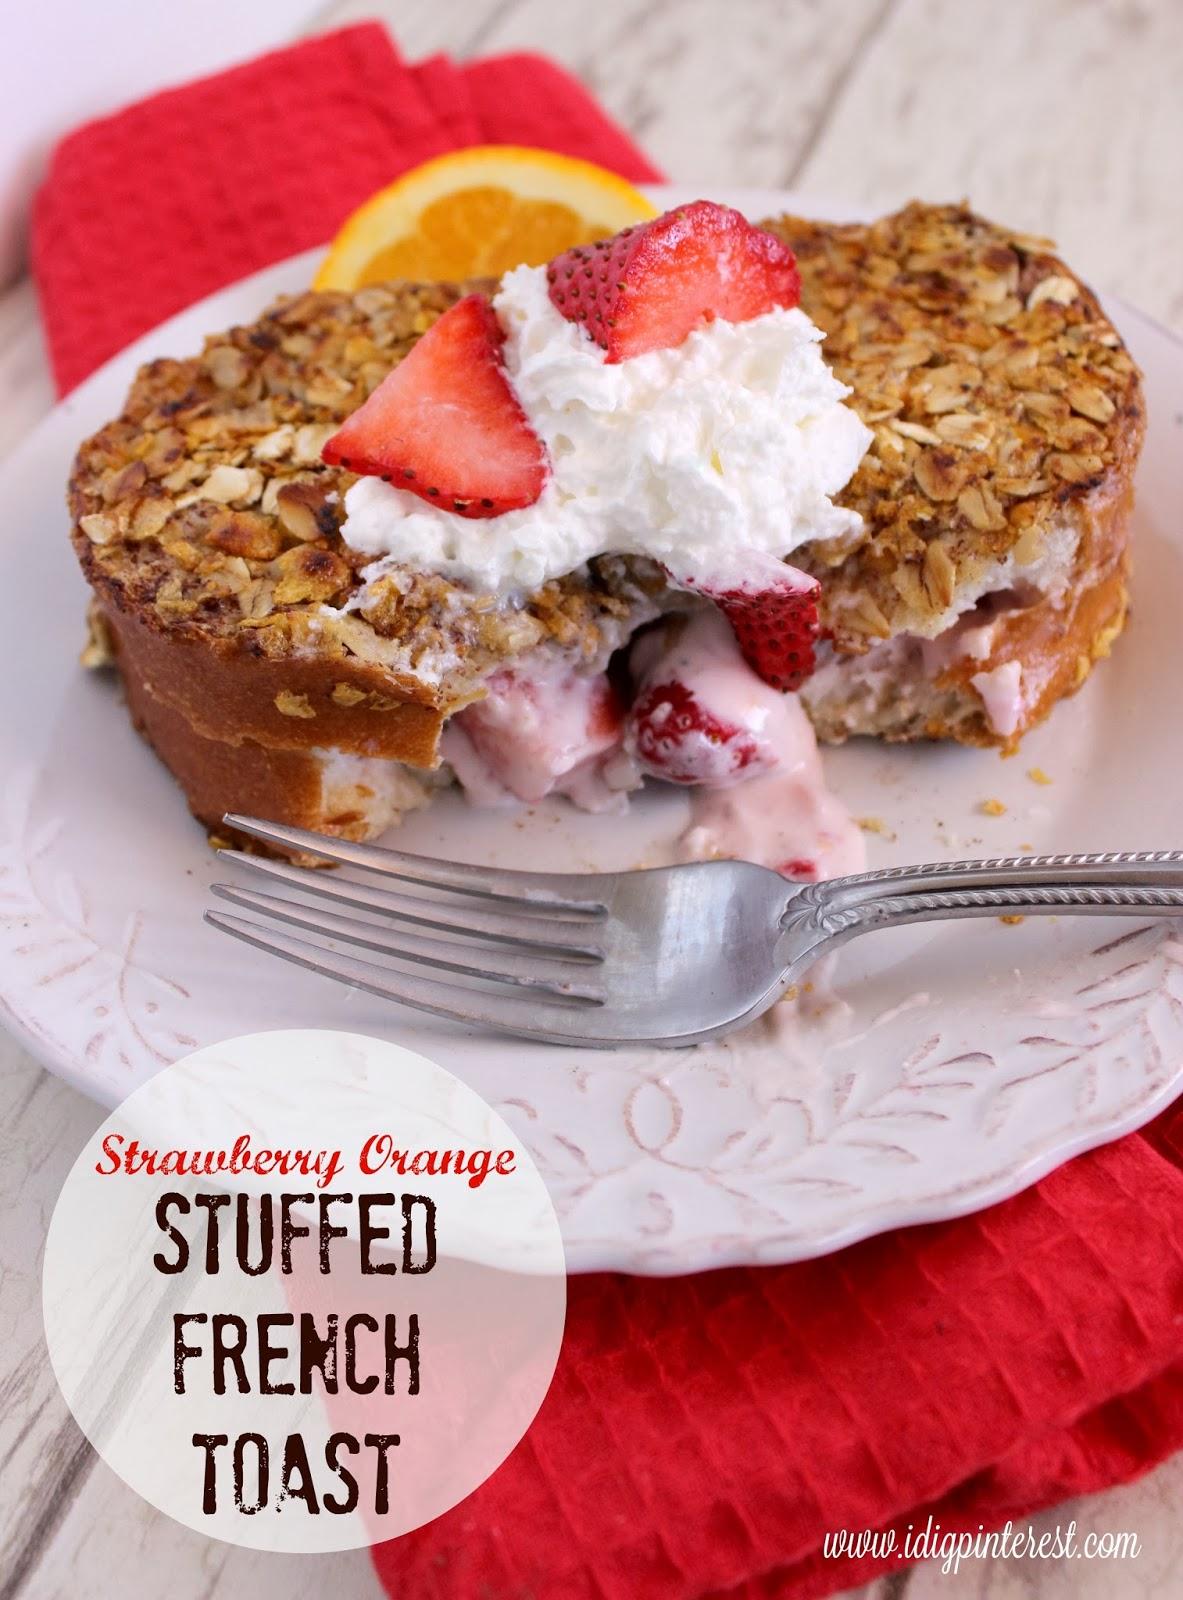 ... : Strawberry Orange Stuffed French Toast: January Mystery Dish